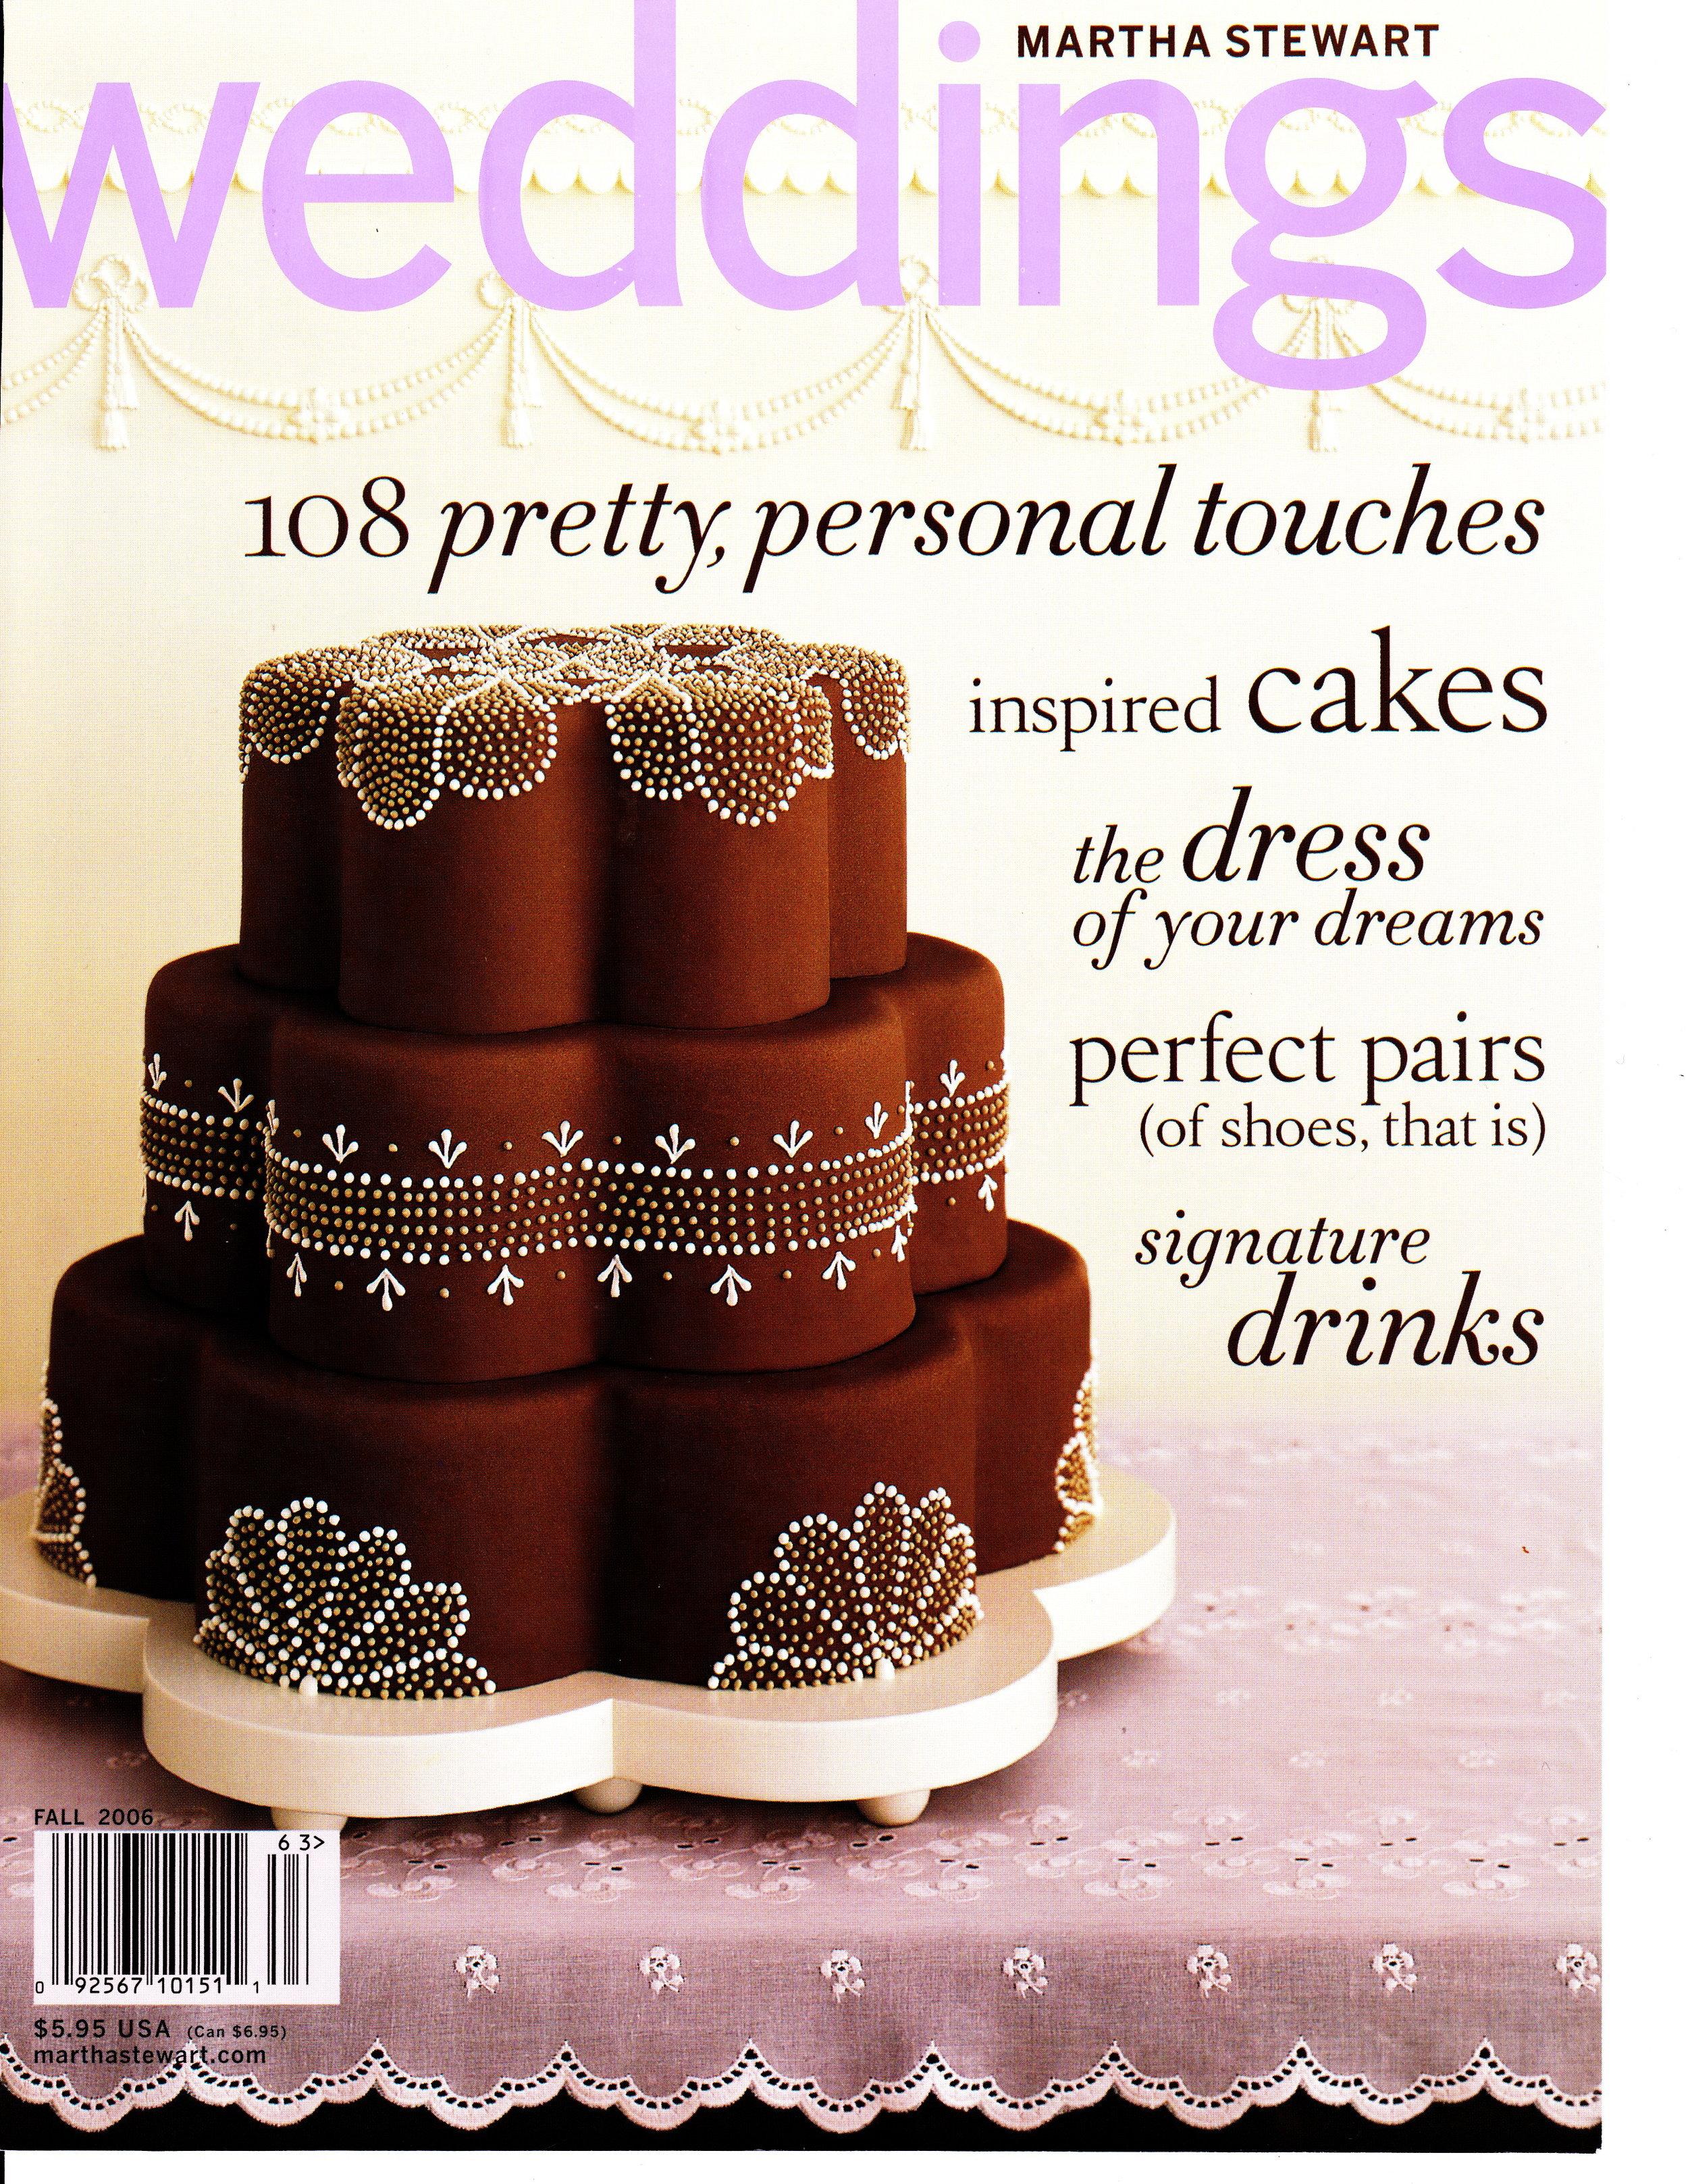 2006 Fall MS weddings.jpg